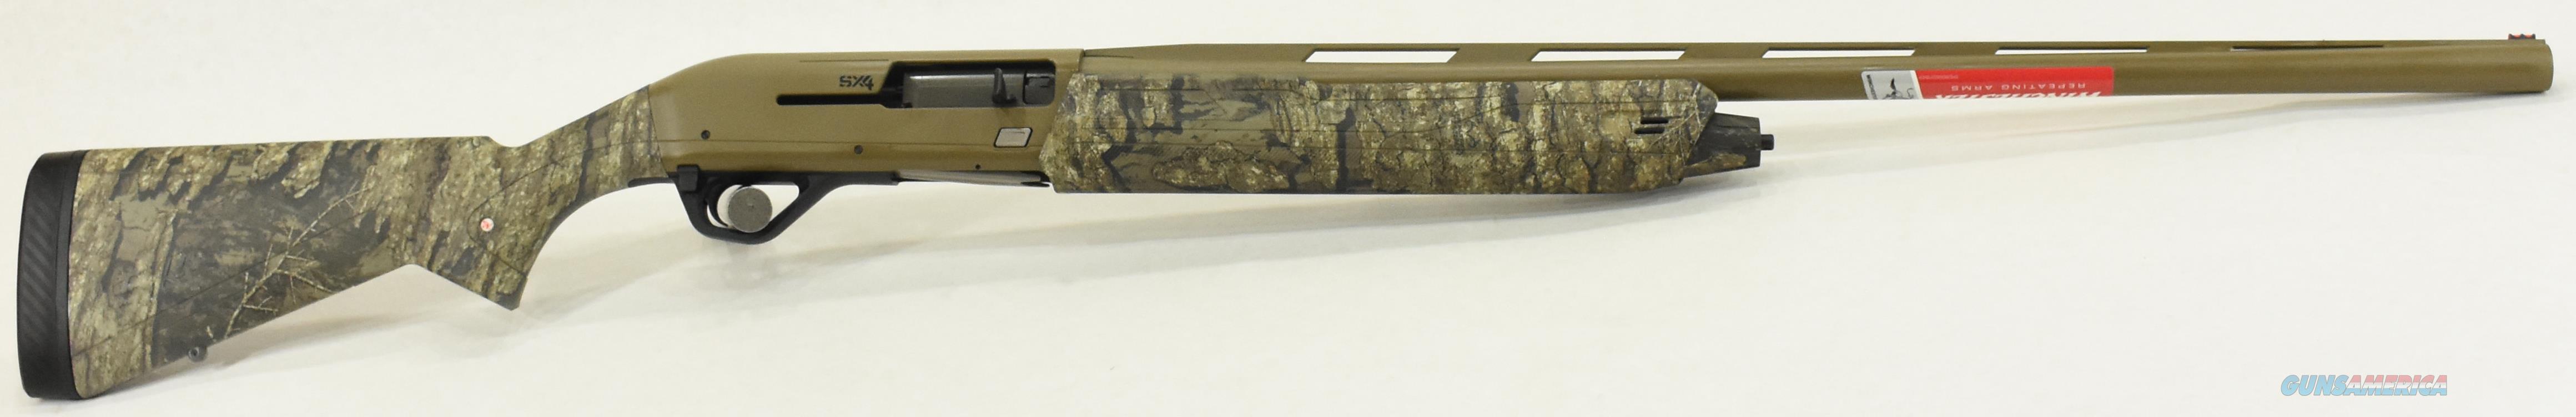 SX4 Hybrid Hunter Timber 12Ga 28-3.5In  511249292  Guns > Shotguns > Winchester Shotguns - Modern > Autoloaders > Hunting